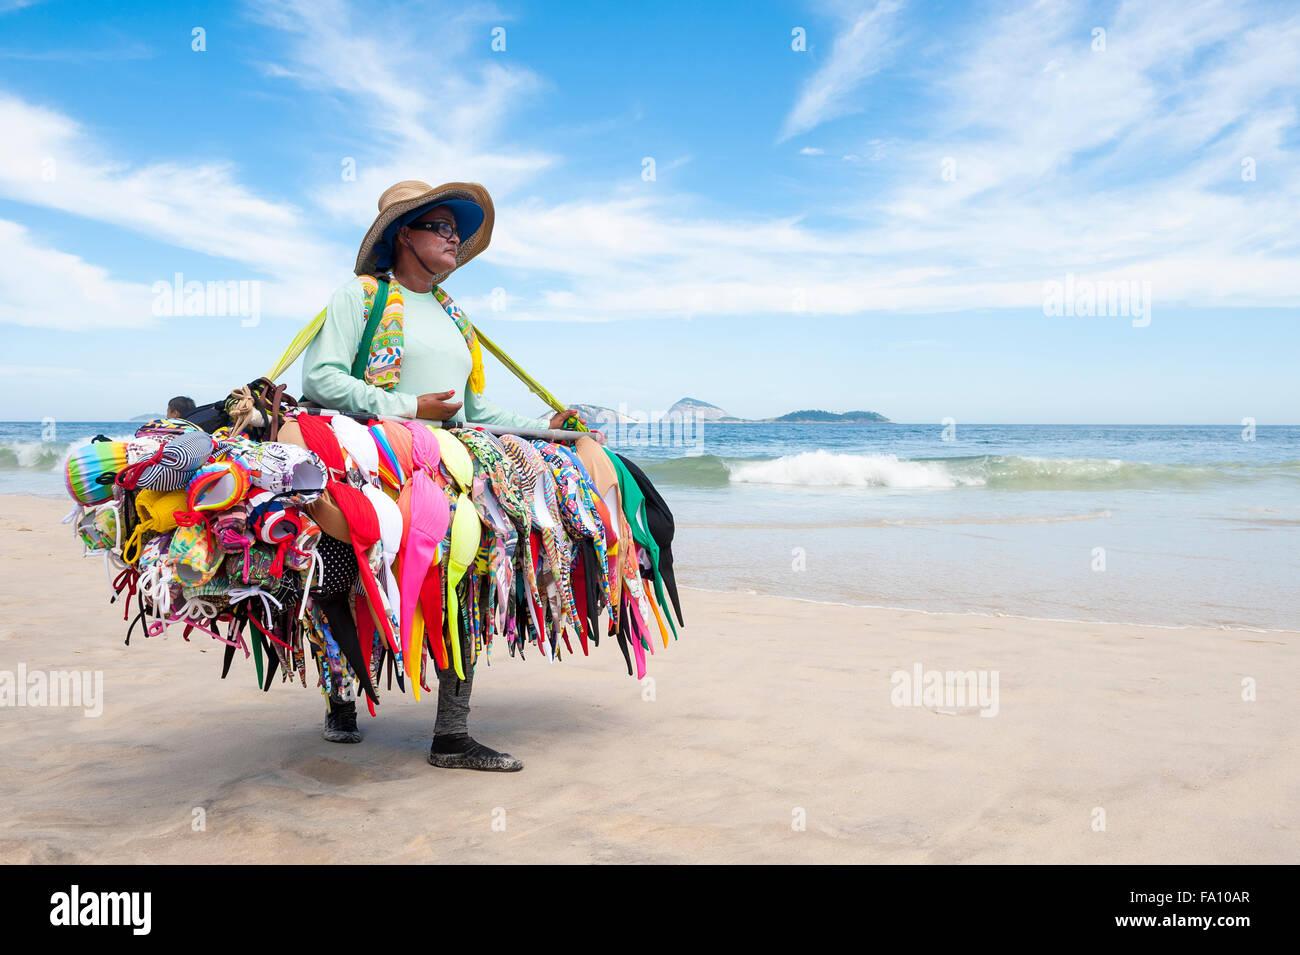 RIO DE JANEIRO, BRAZIL - MARCH 15, 2015: A beach vendor selling bikinis carries her merchandise along Ipanema Beach. Stock Photo